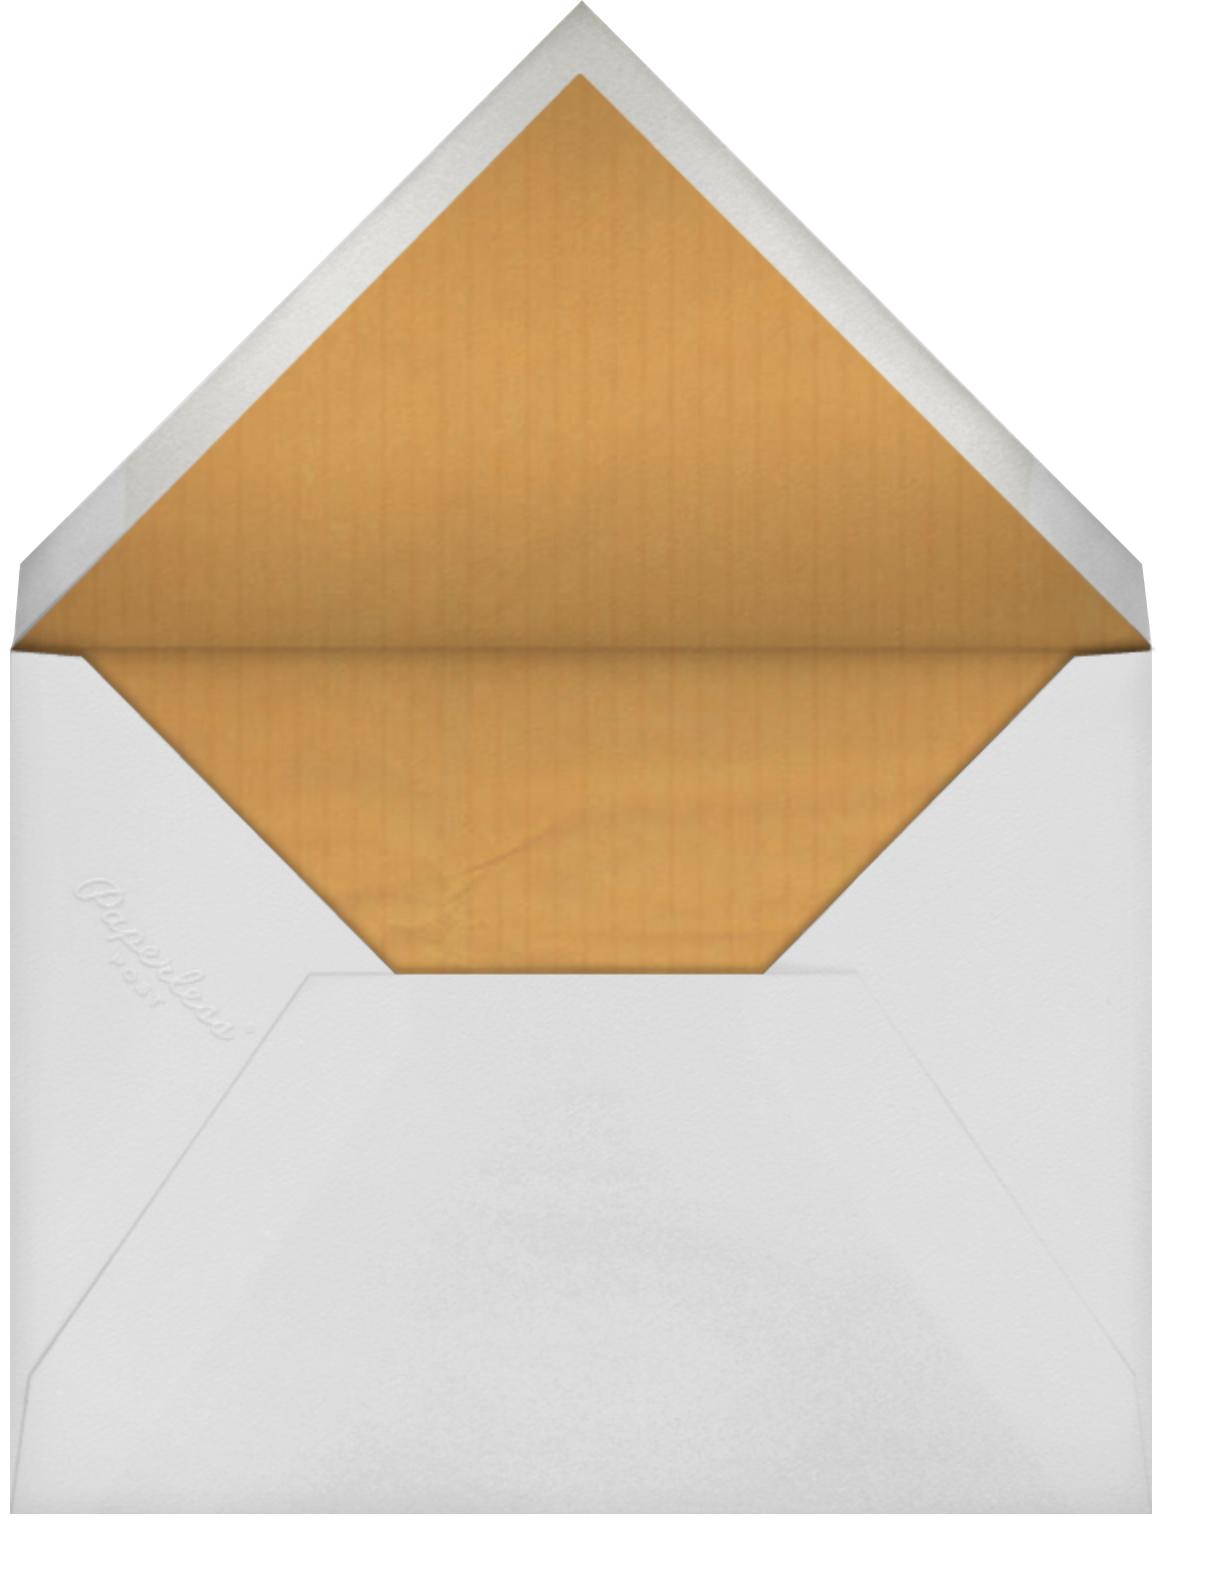 Tender Buttons - Indigo - Anthropologie - Thank you - envelope back